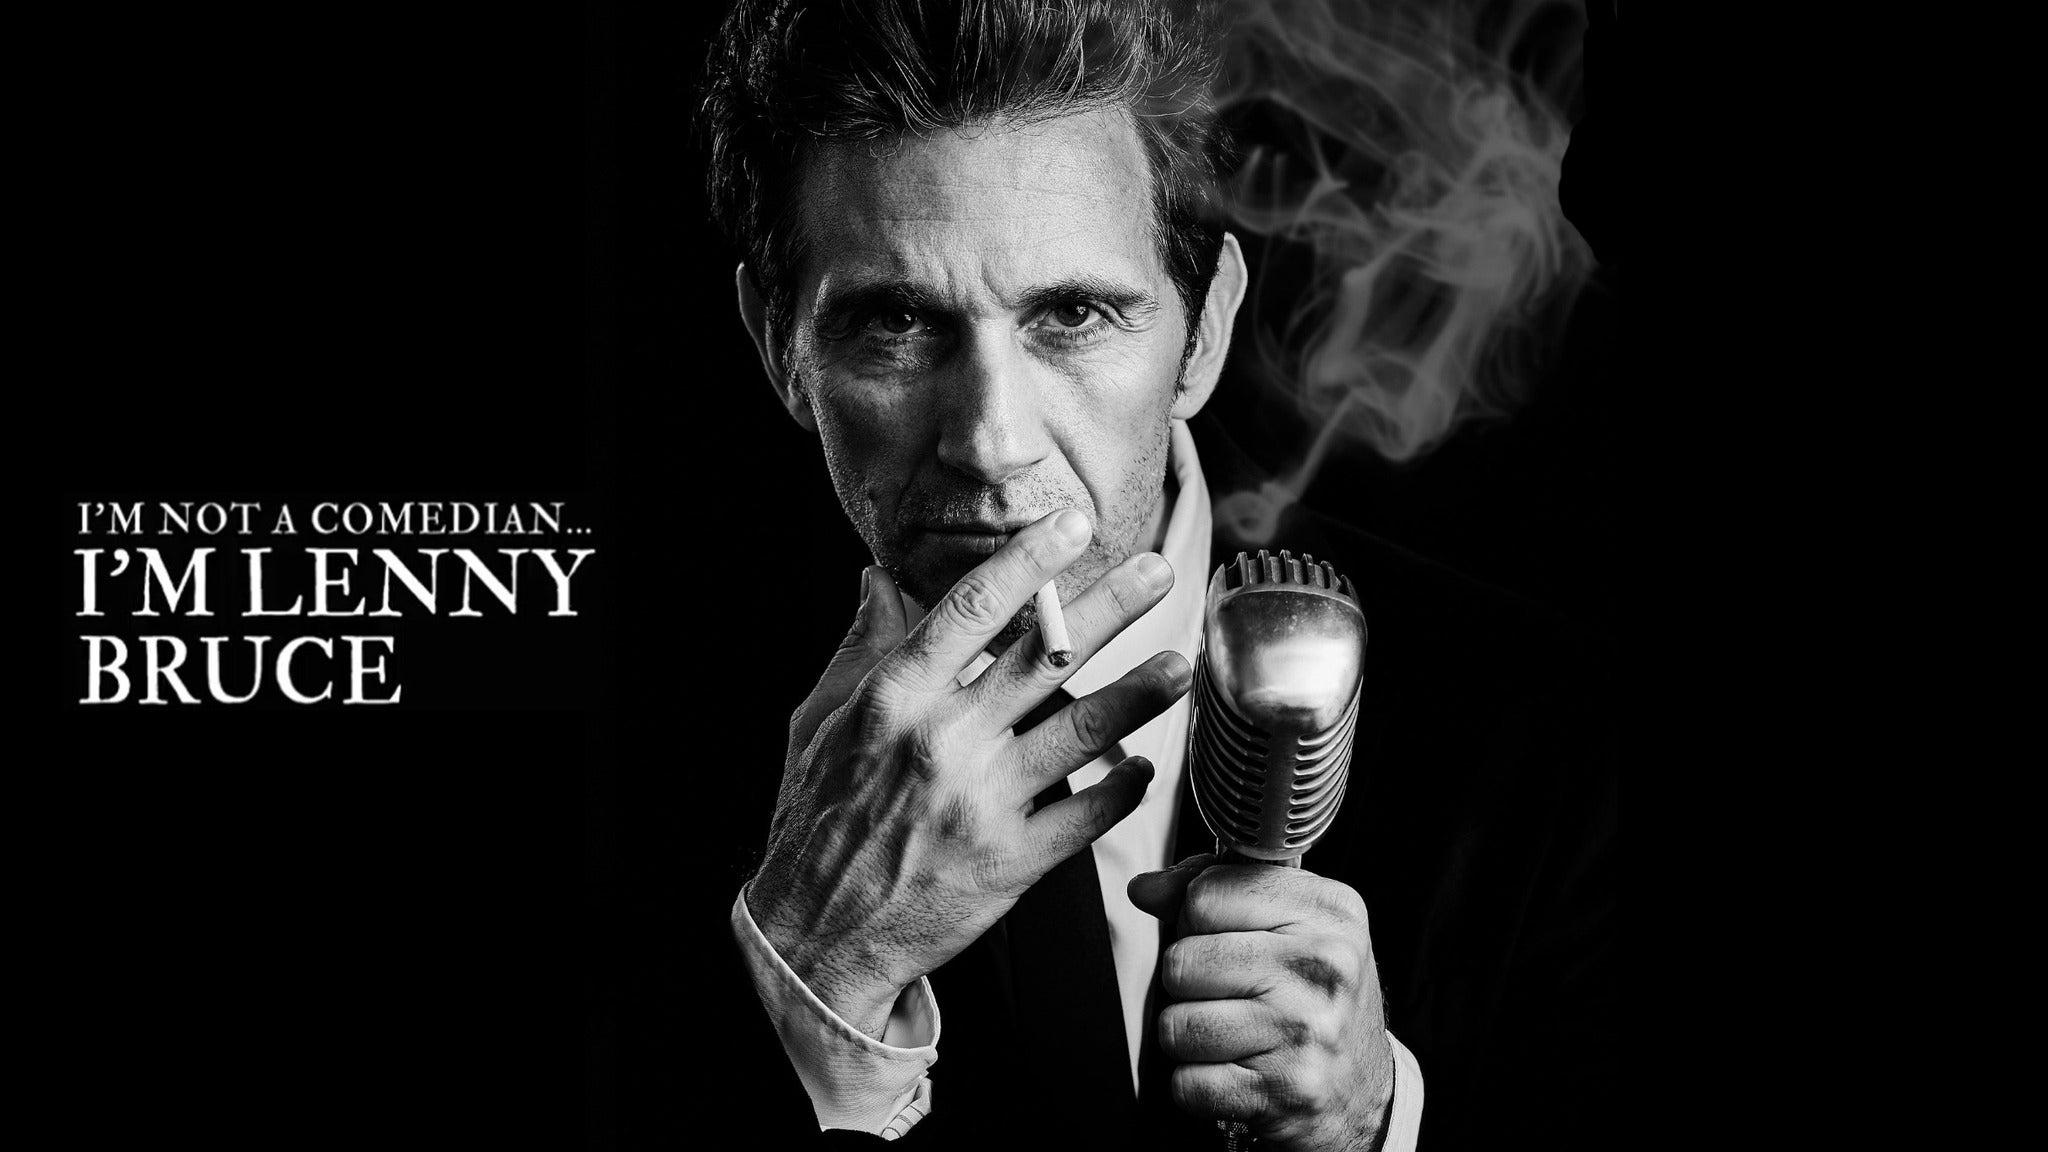 I'm Not a Comedian...I'm Lenny Bruce (Chicago)